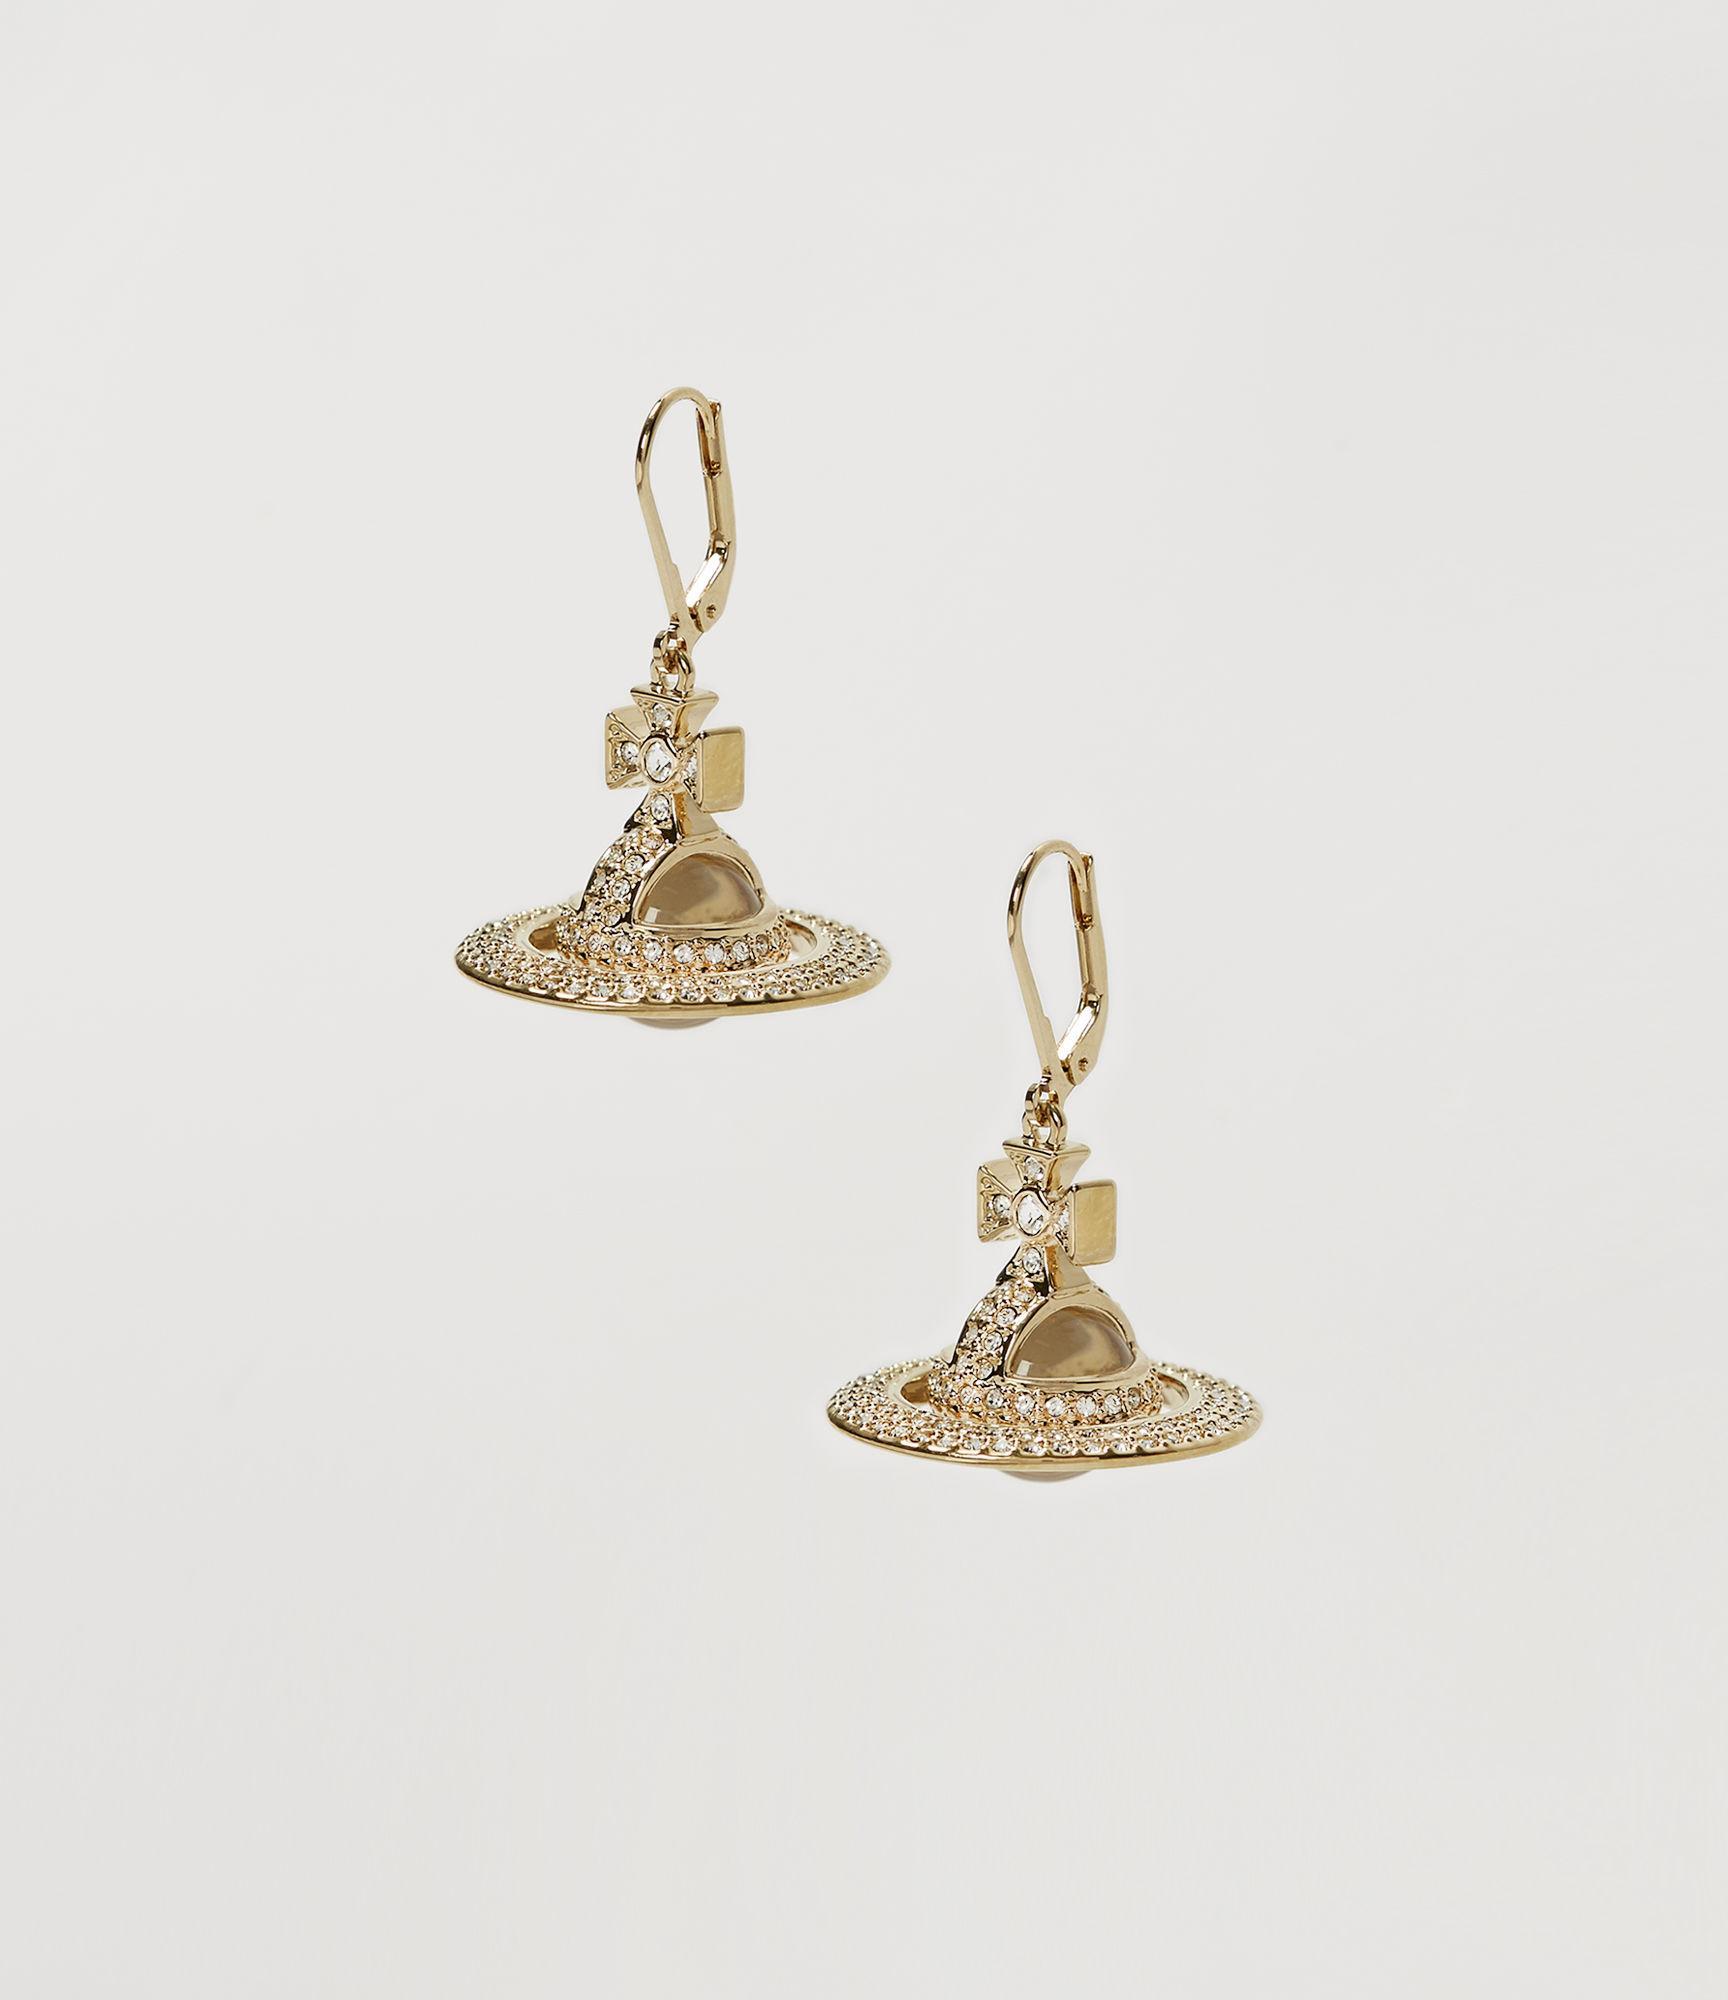 7ebd419ff Vivienne Westwood Sorada Orb Earrings Gold Tone in Metallic - Lyst